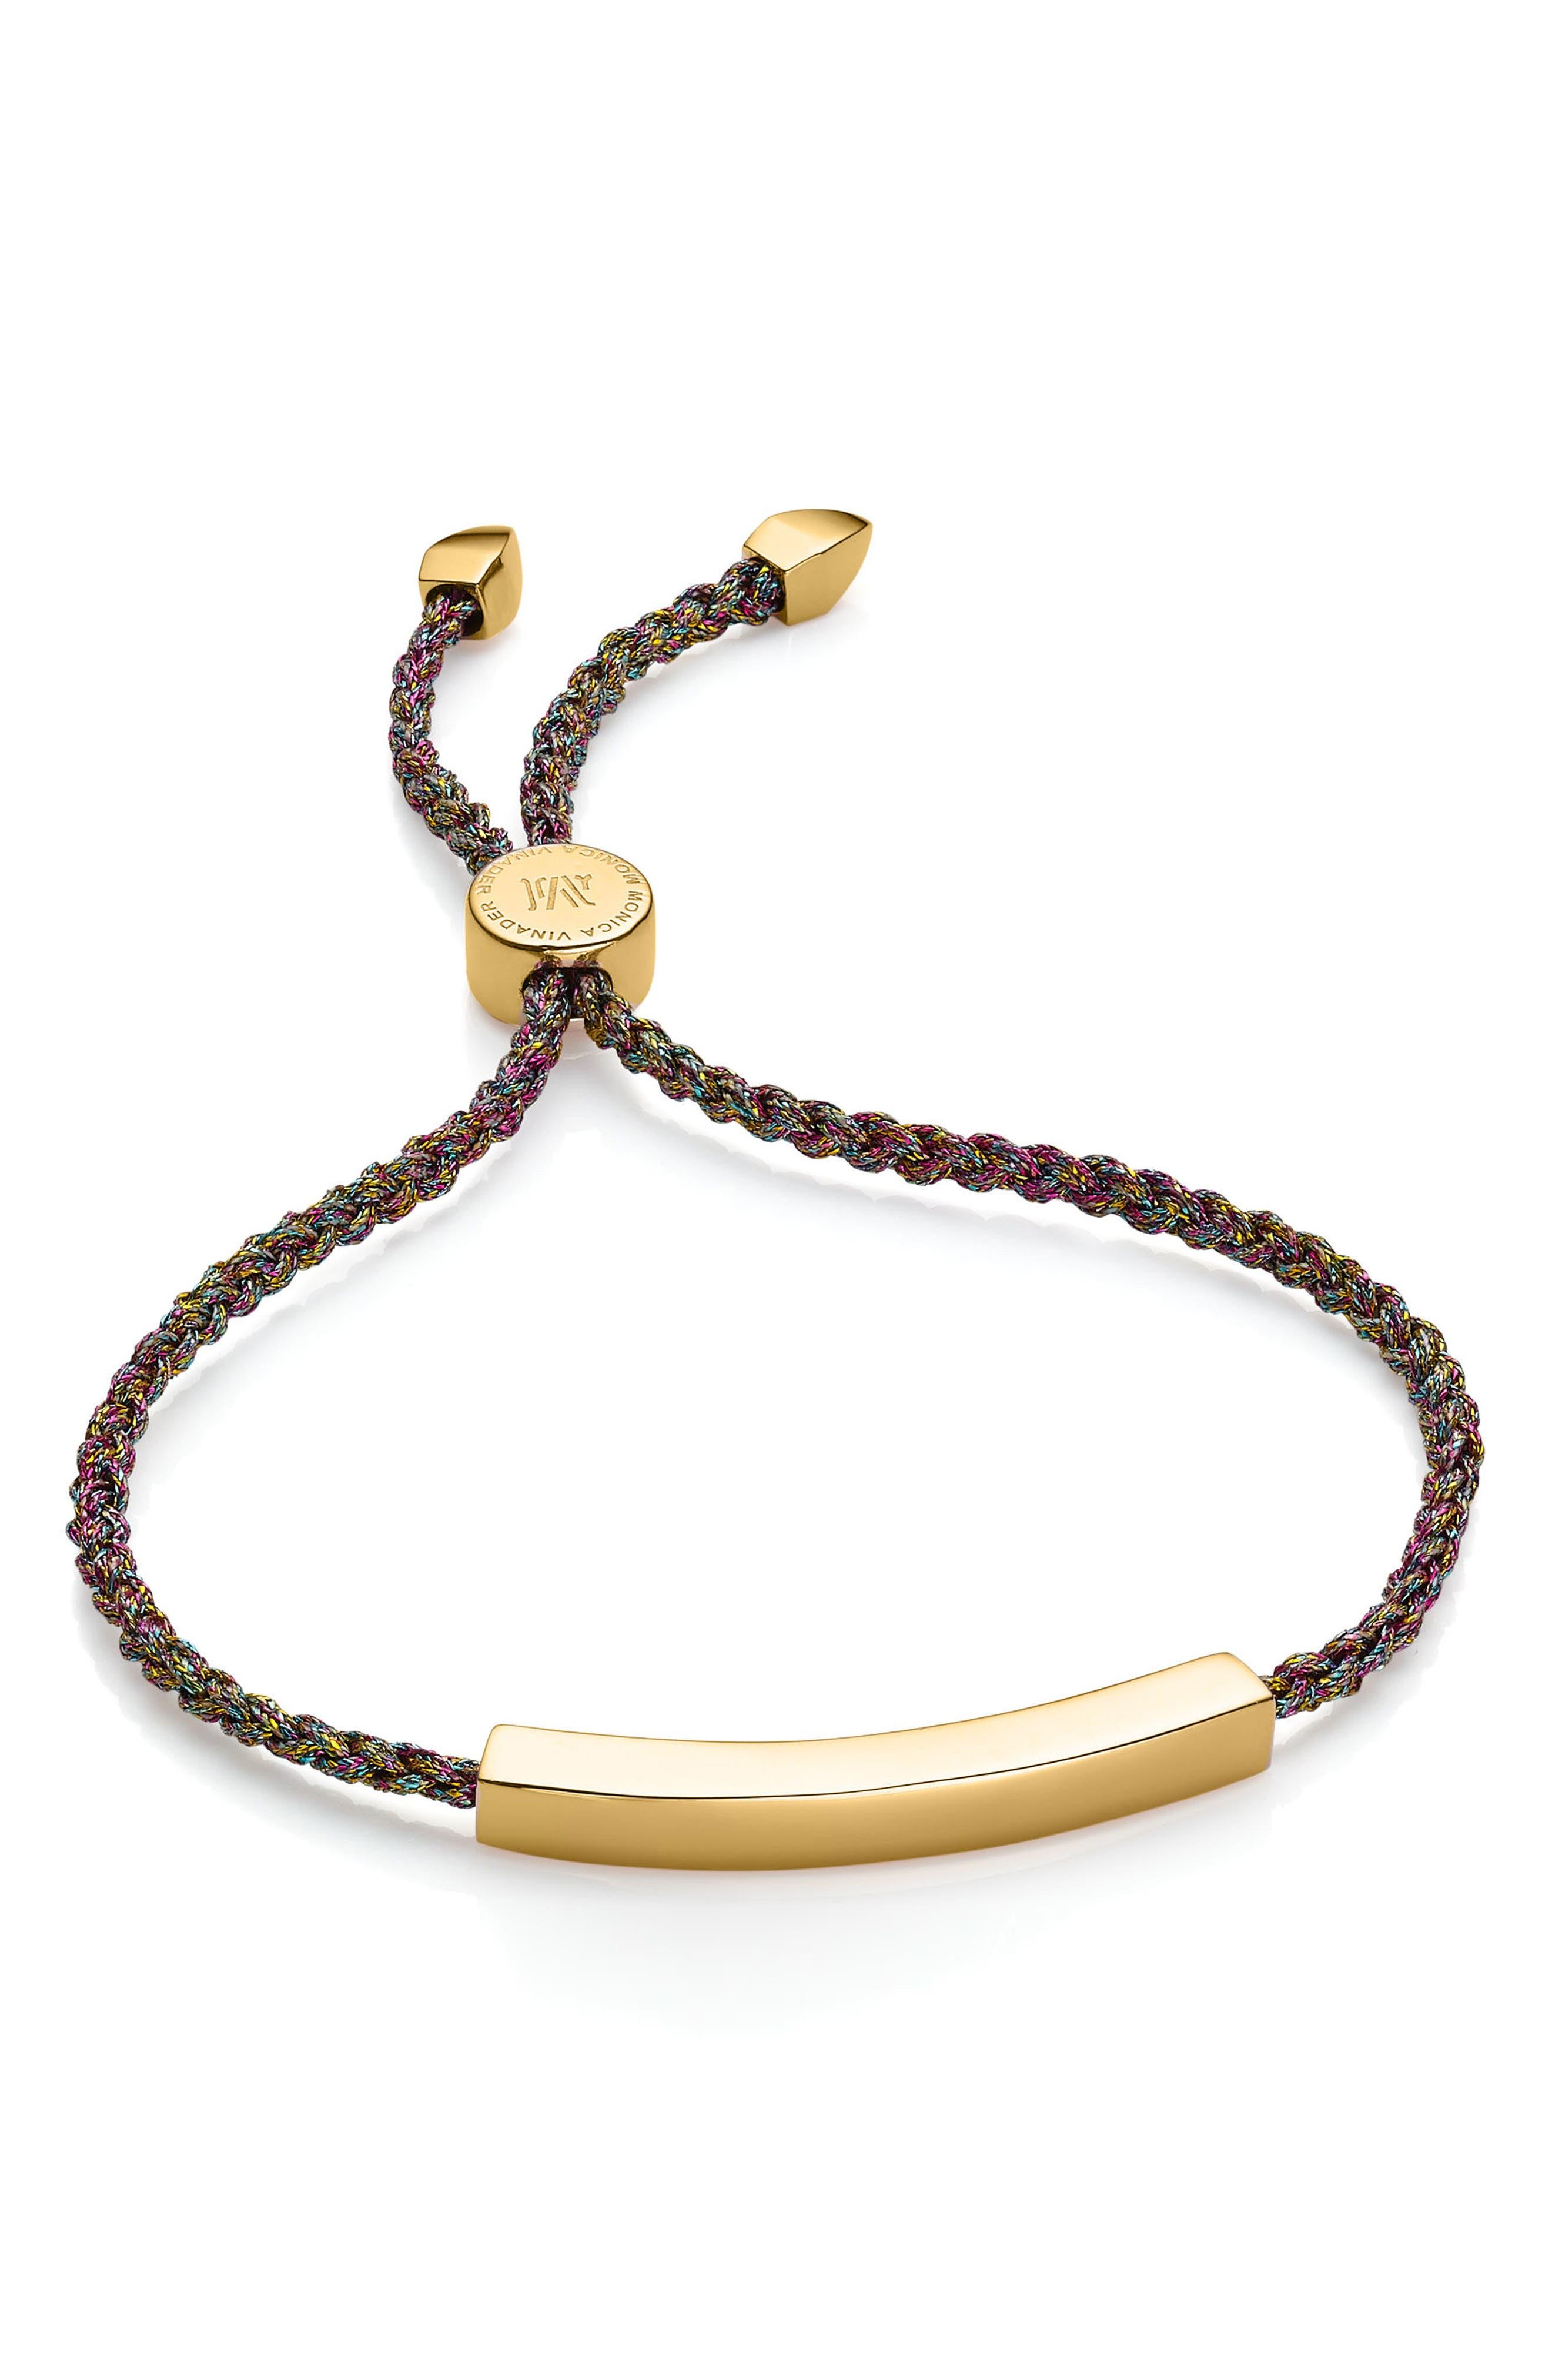 Engravable Linear Bar Friendship Bracelet,                             Main thumbnail 1, color,                             GOLD/ RAINBOW